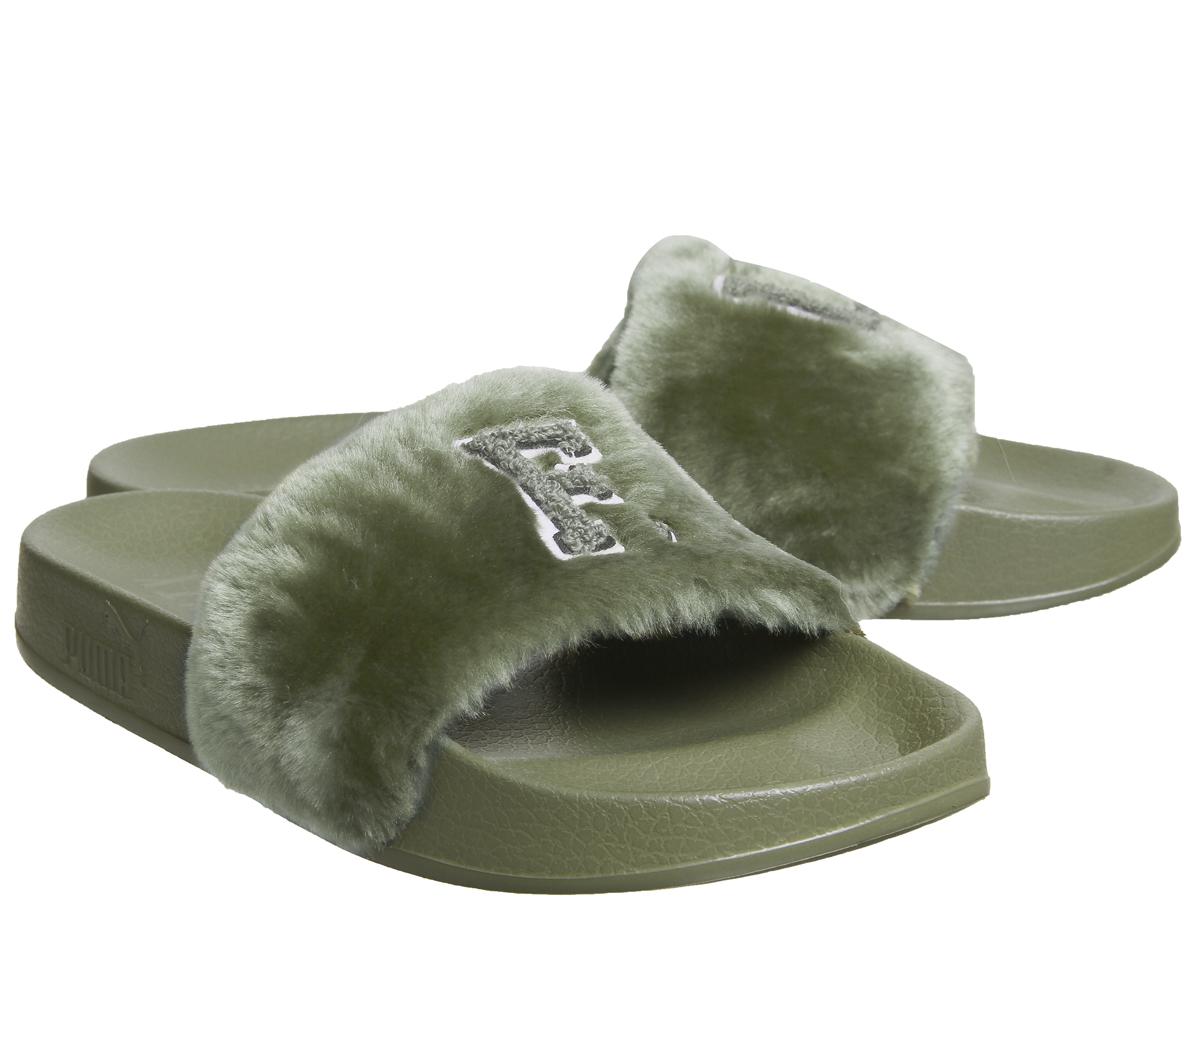 f9690a34cee73 Sentinel Womens Puma Fenty Leadcat Sliders FU GREEN Trainers Shoes